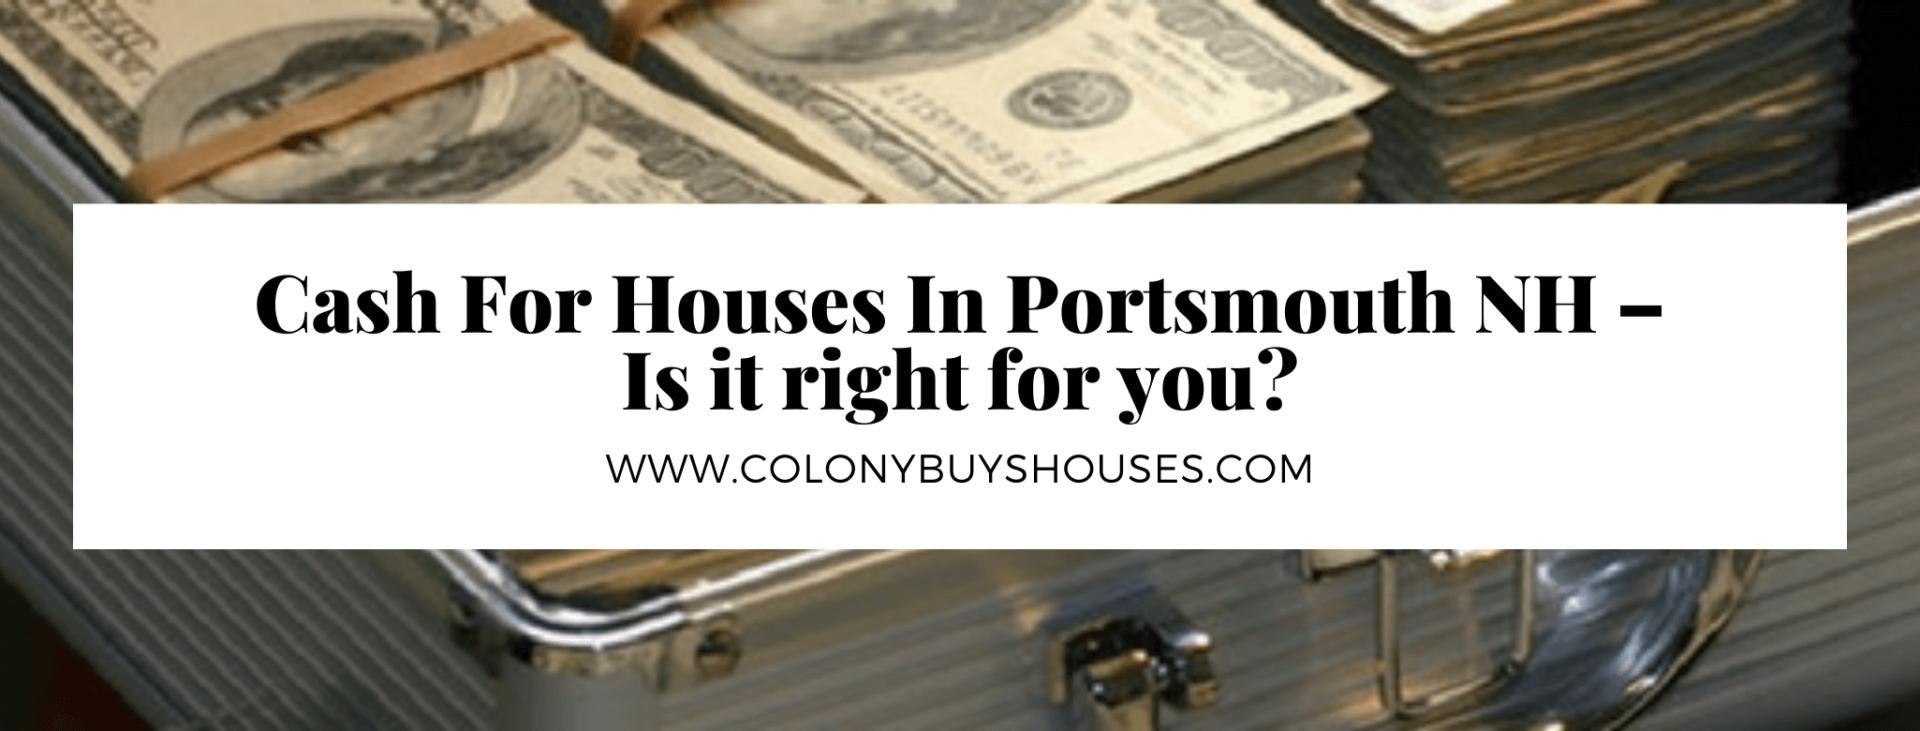 we buy properties in Portsmouth NH